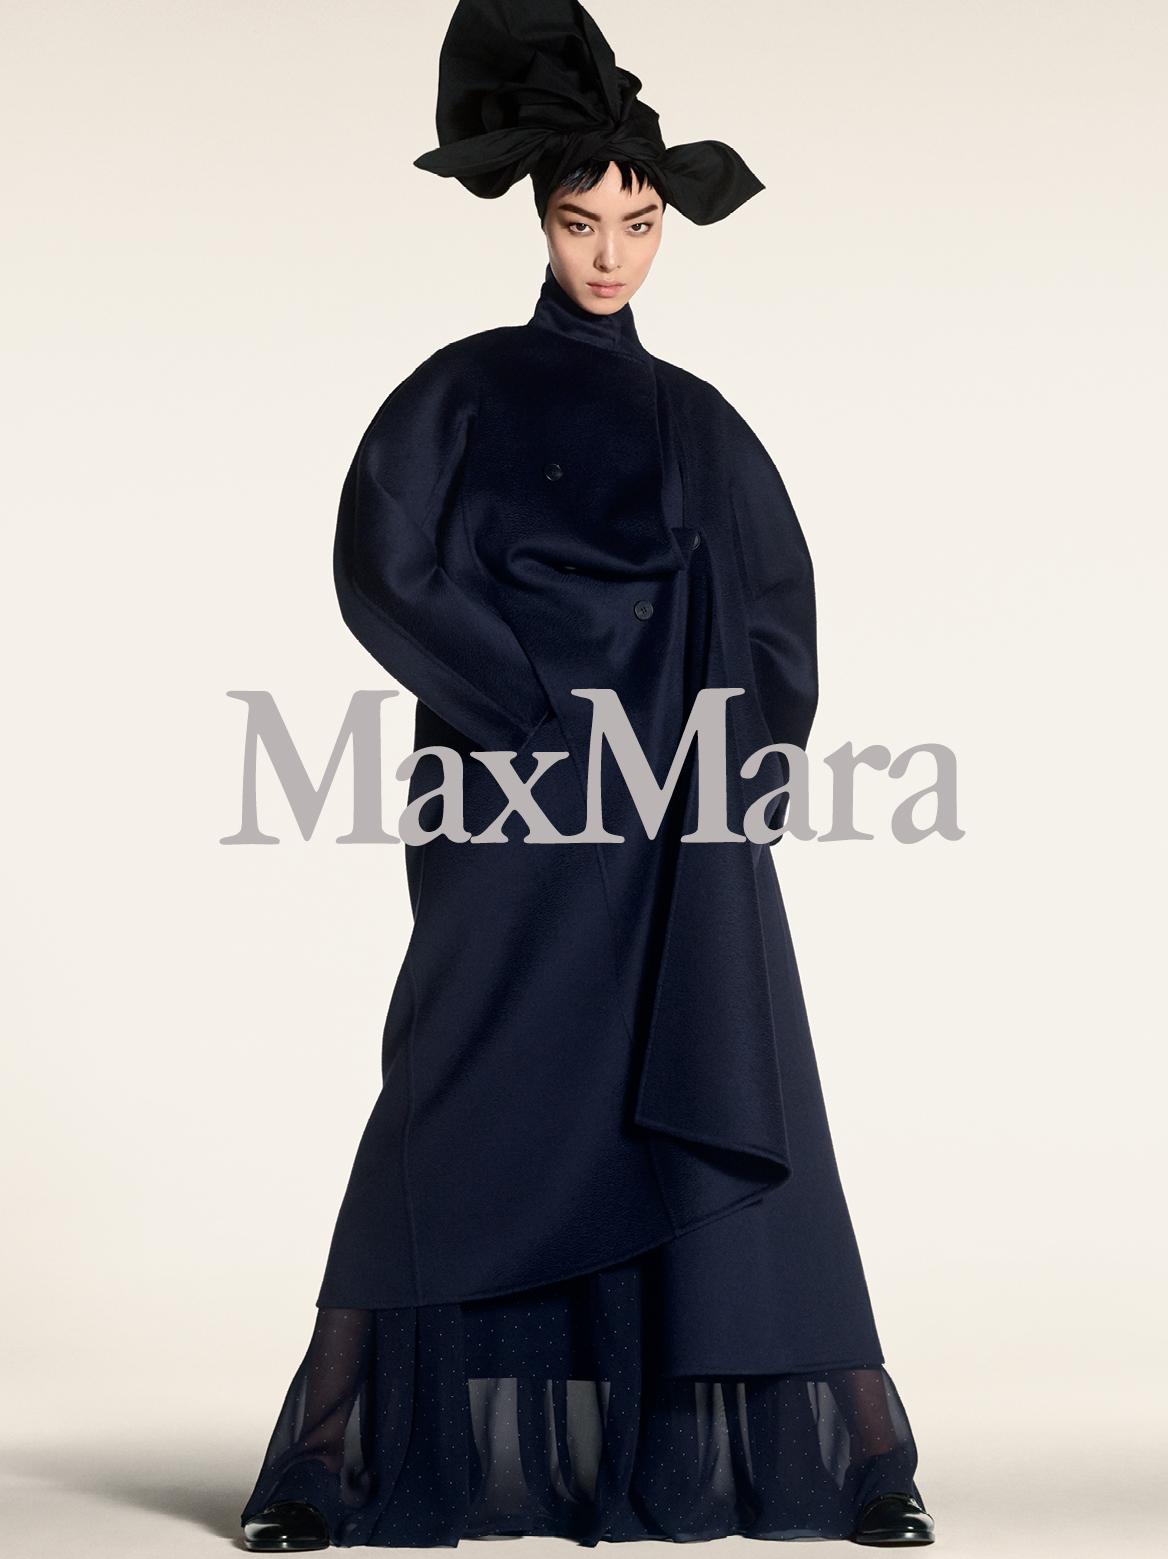 #maxmara #prefall18 #stevenmeisel #carineroitfeld #feifei #fashion #campaign #jimkaemmerling #patmcgrath #guidopalau